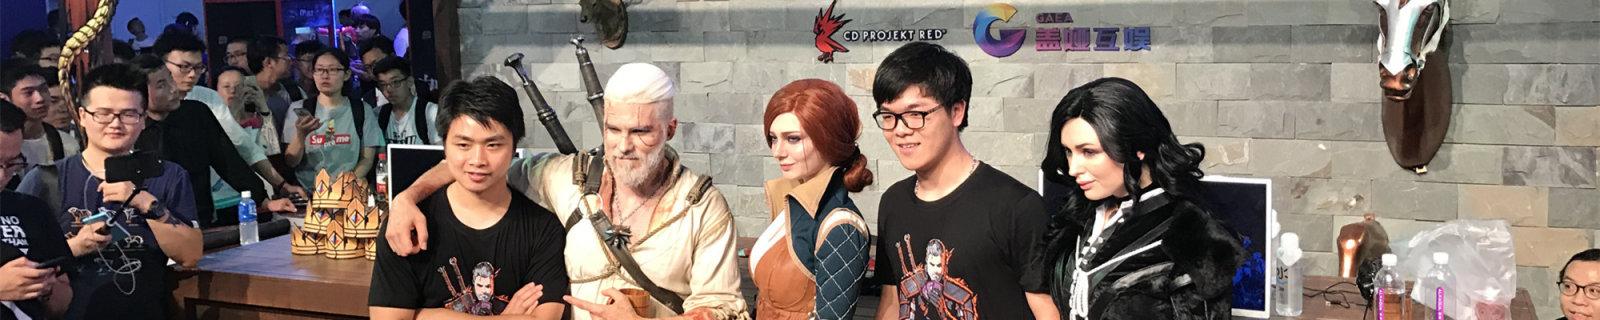 Chinajoy上的几位猎魔人coser